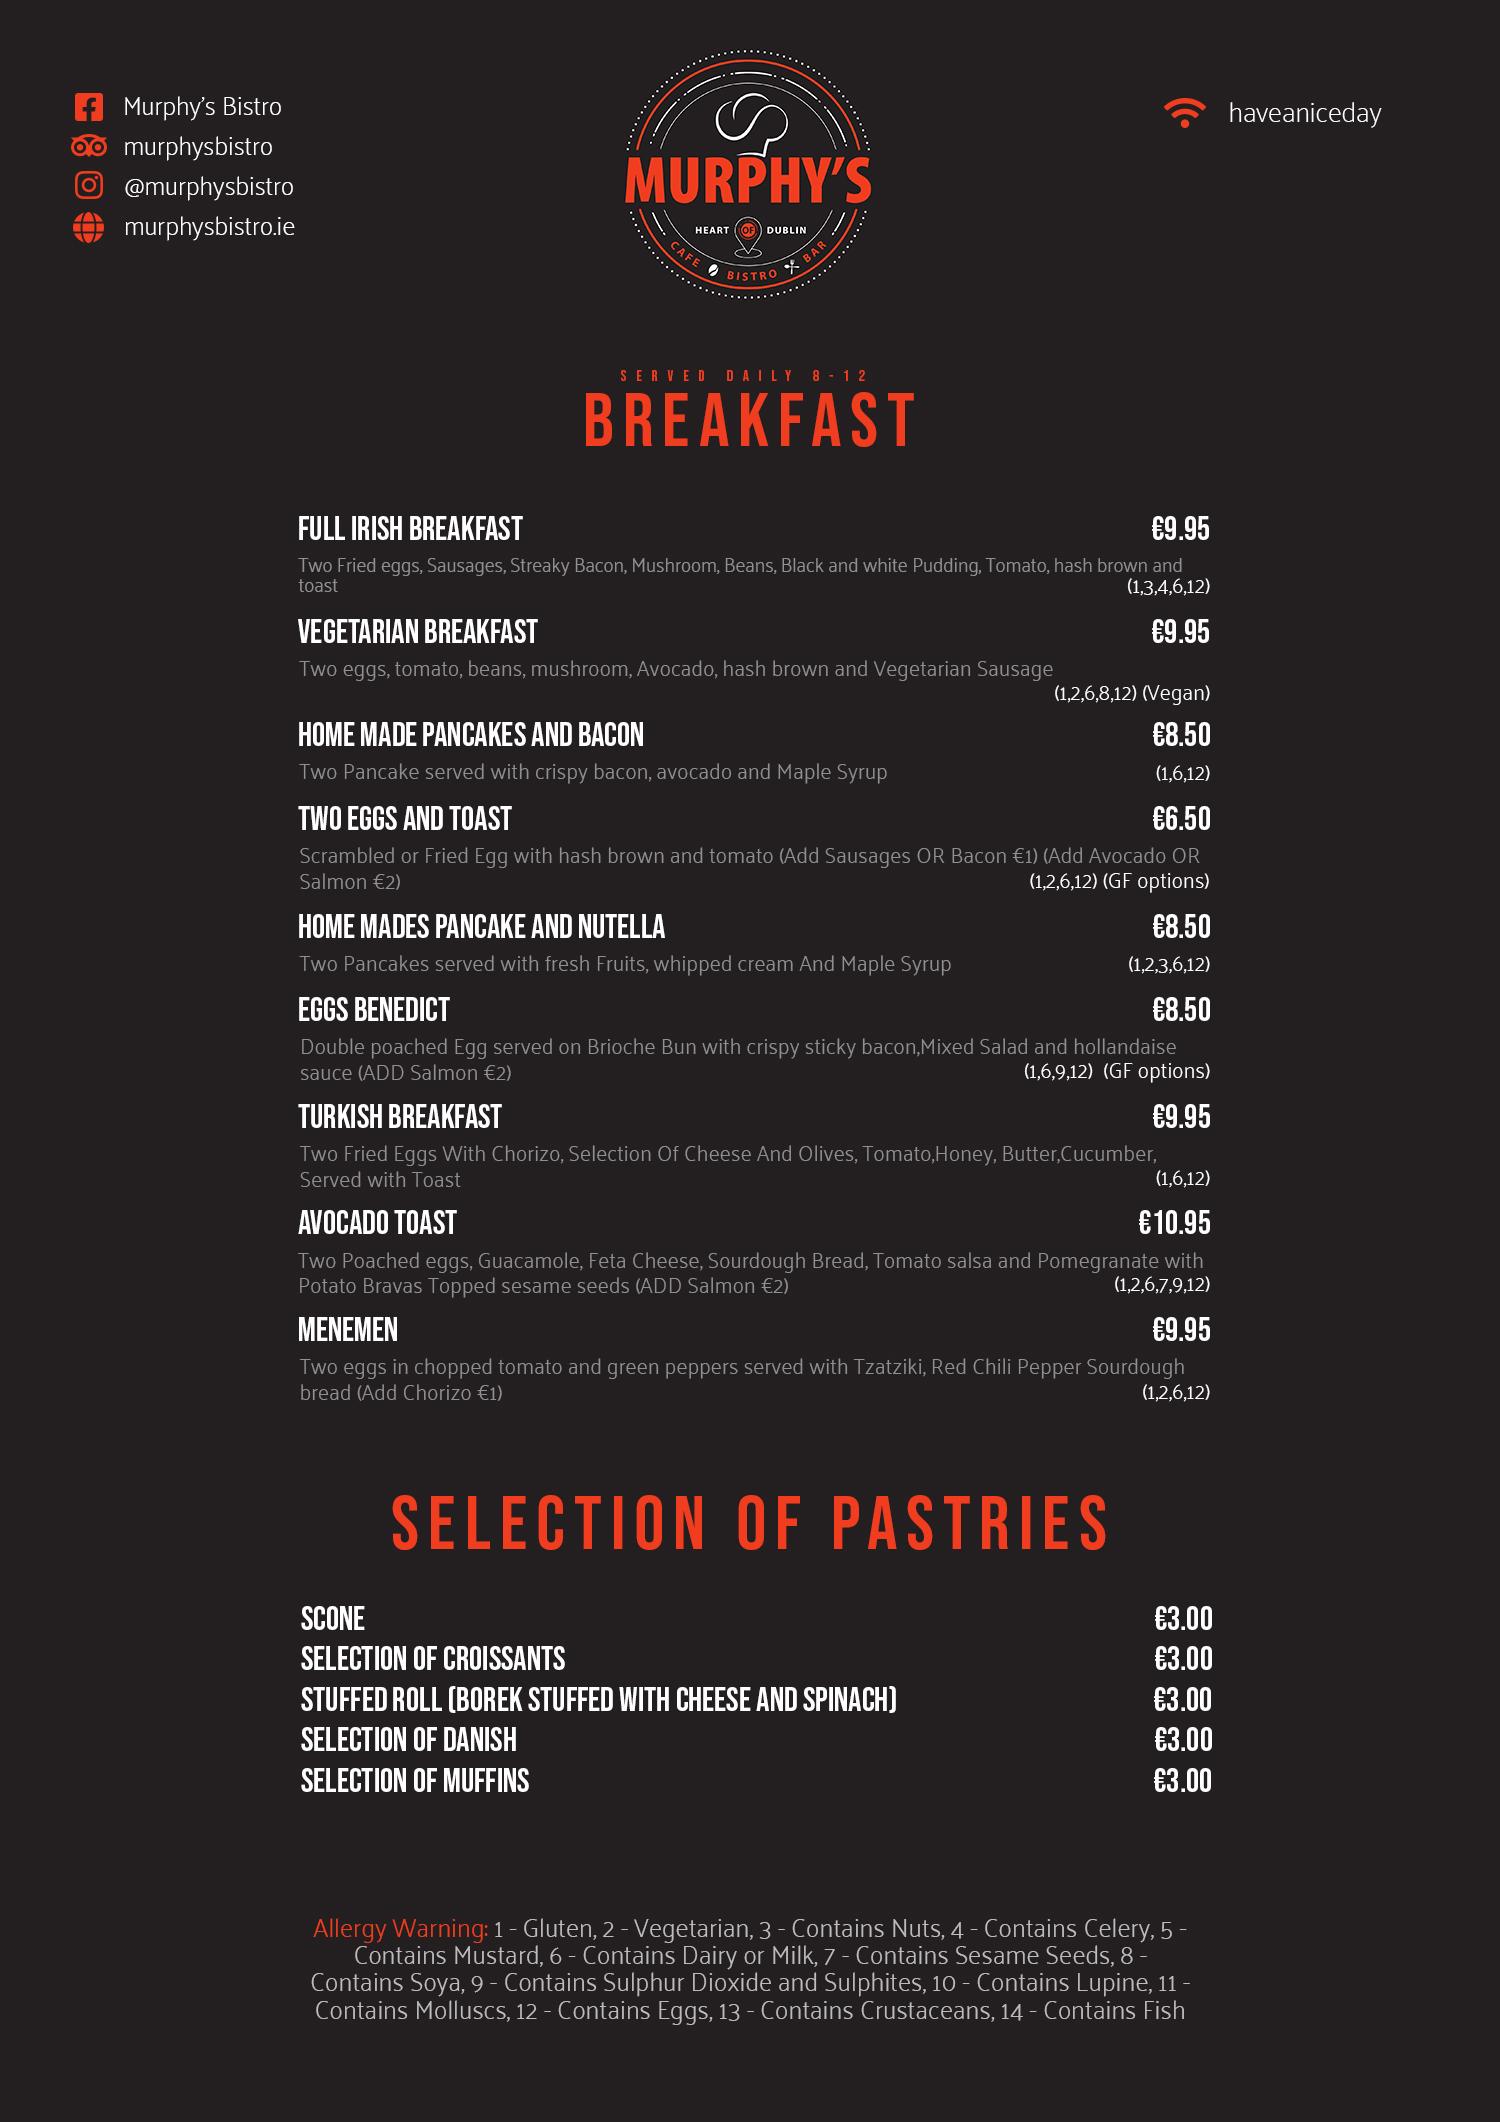 Breakfast Menu at Murphy's Bistro Cafe